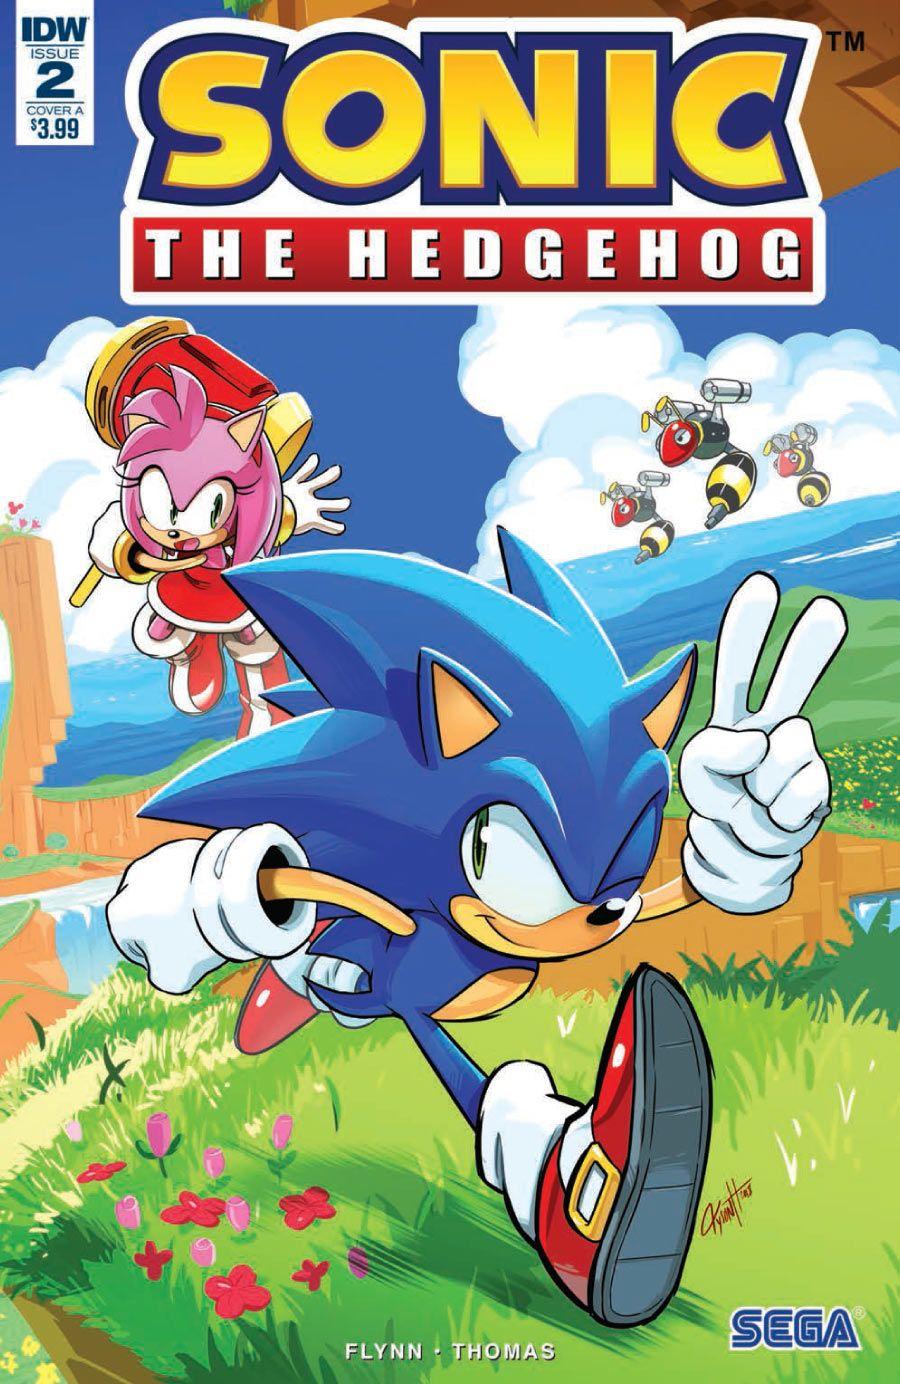 Exclusive Sonic The Hedgehog 2 Cbr